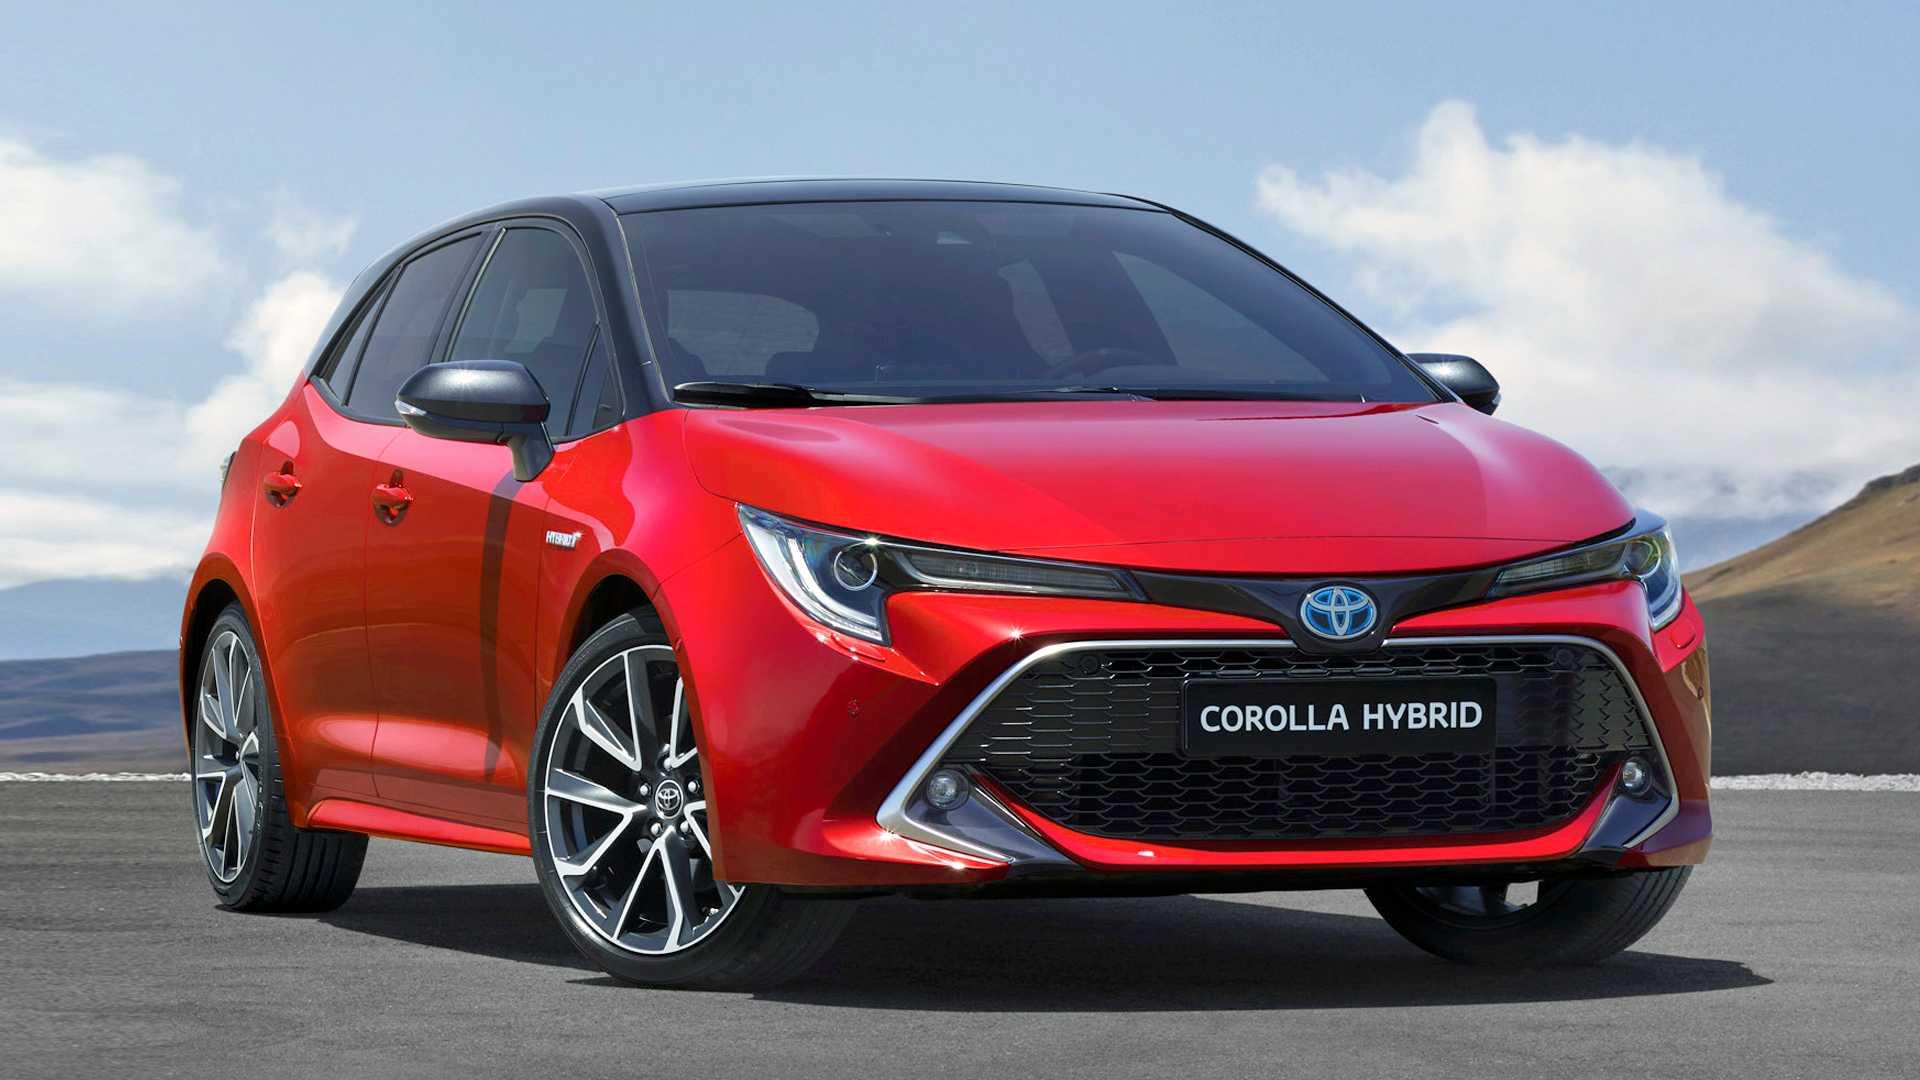 2020 Toyota Corolla HB 1.8 e-CVT